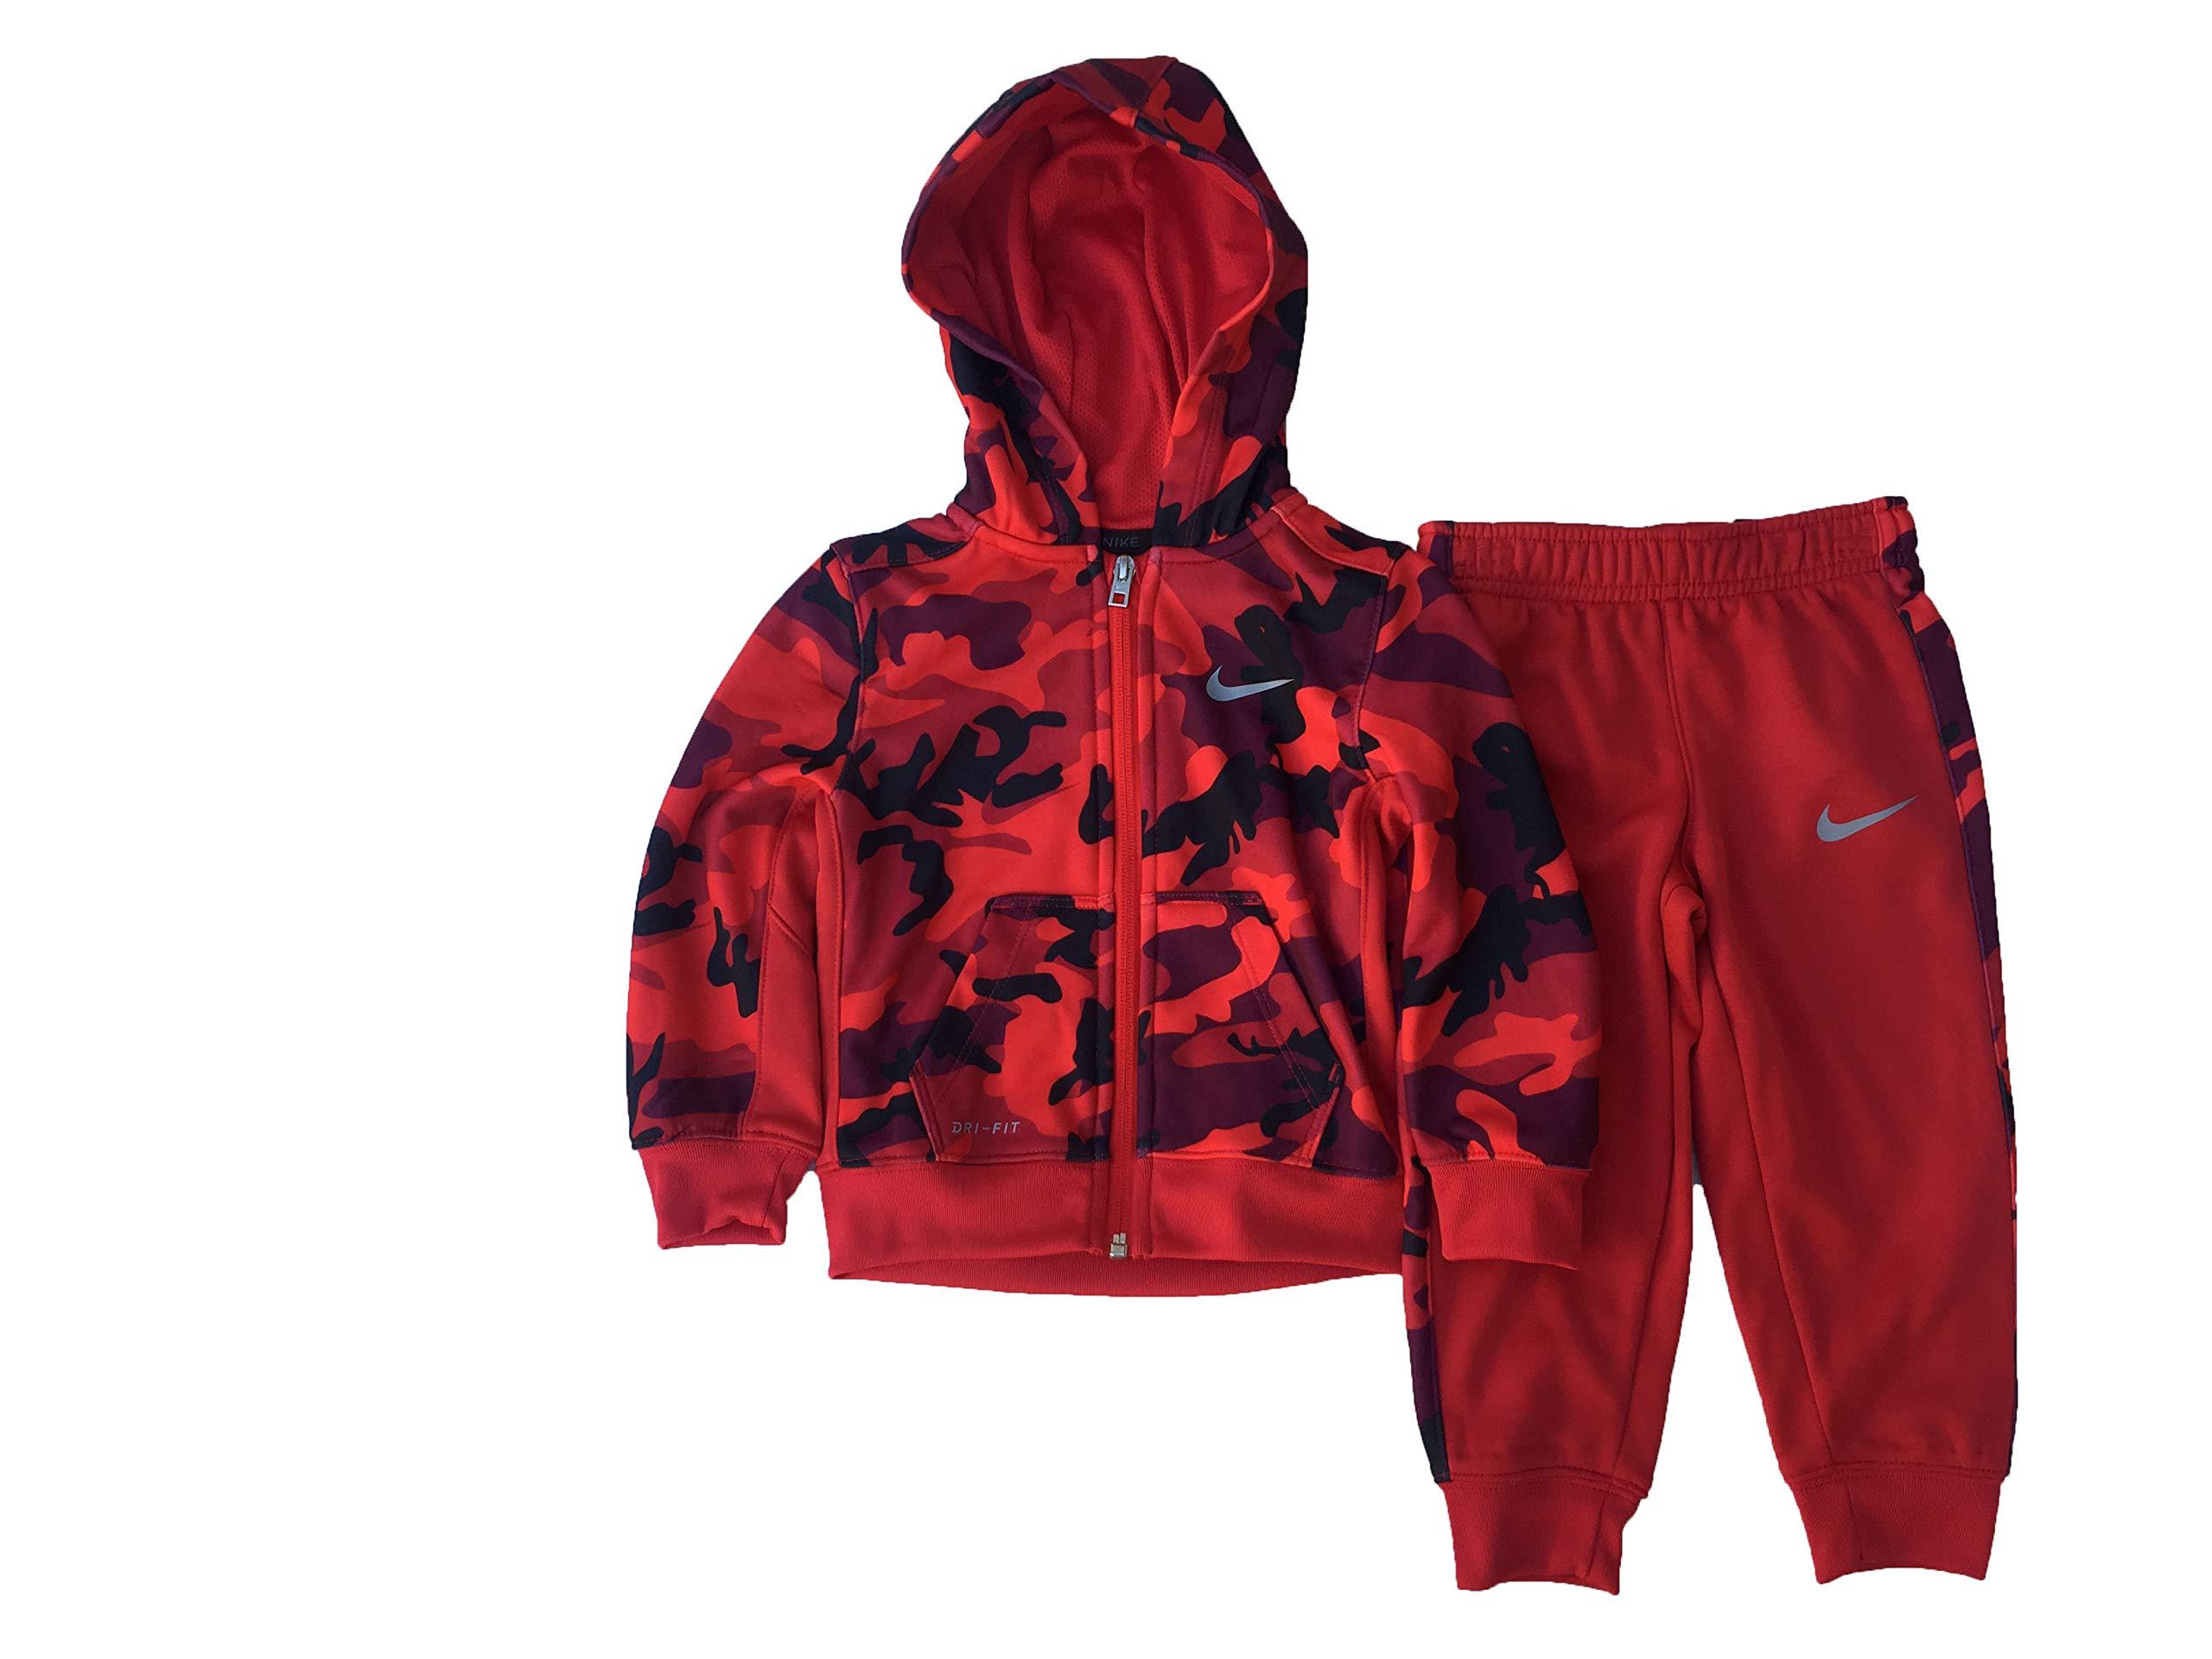 NIKE Boy's Futura Tricot Jacket and Pants Set